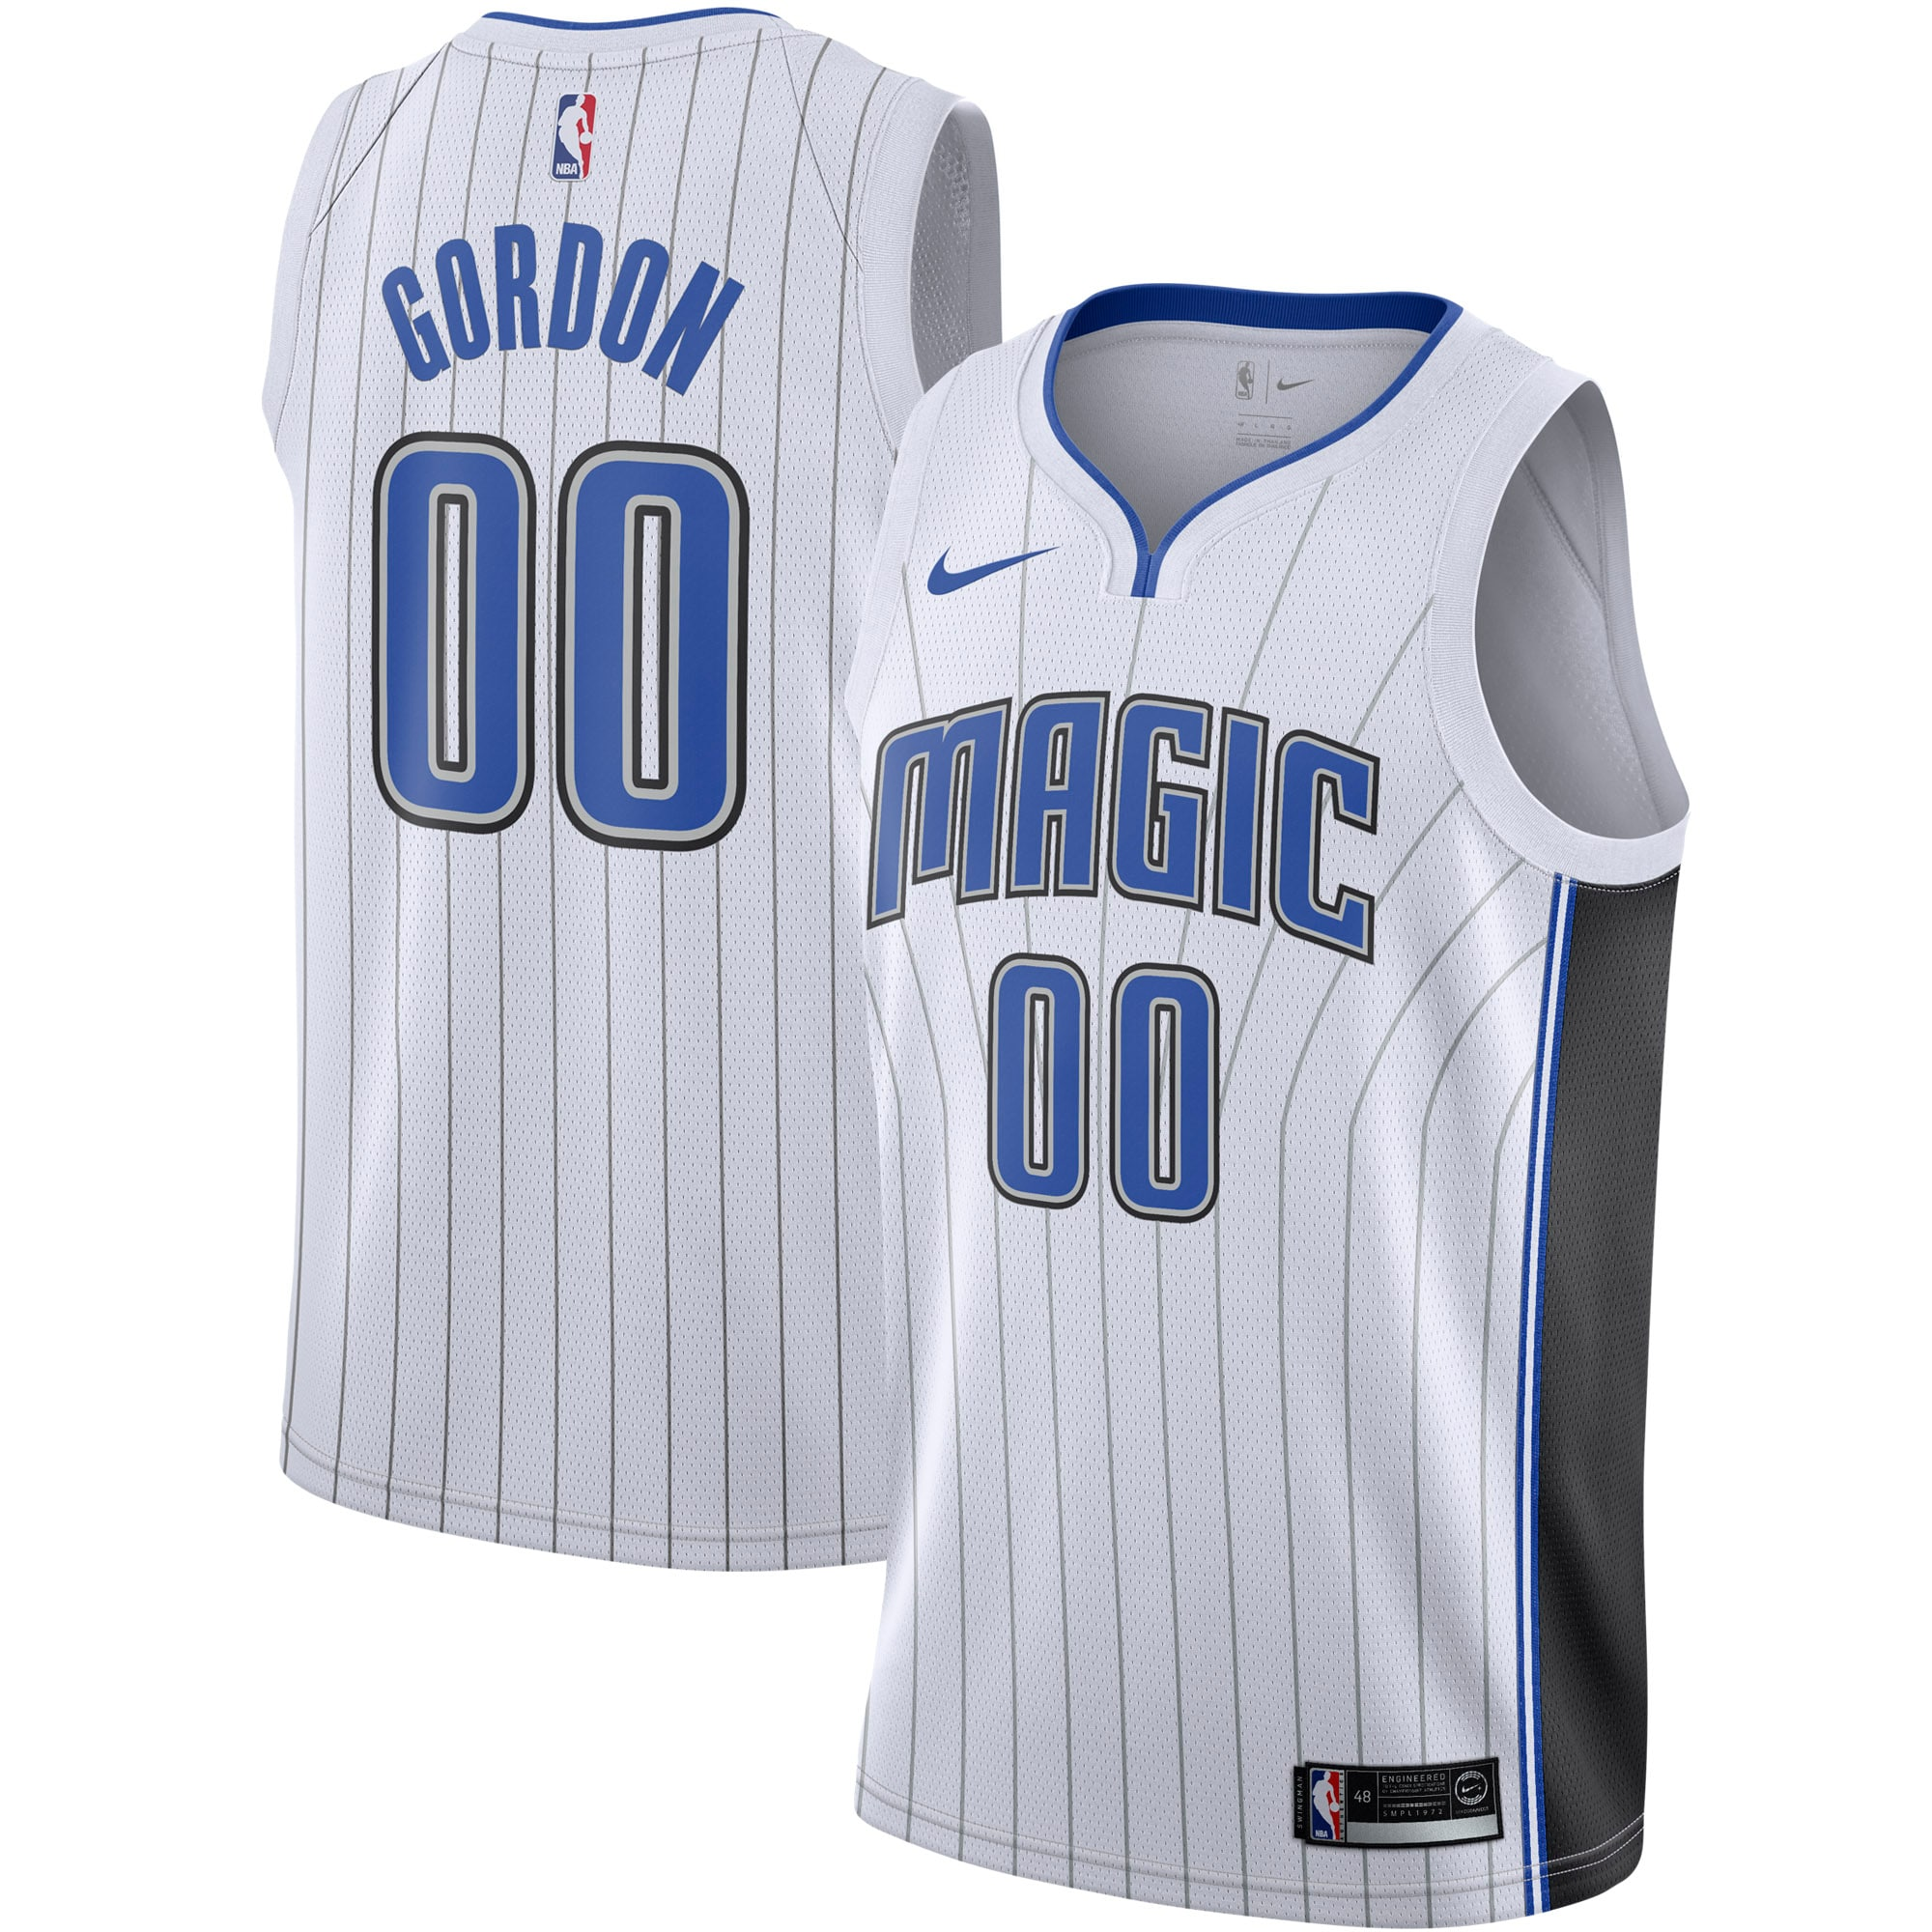 Aaron Gordon Orlando Magic Nike 2019/2020 Swingman Jersey - Association Edition - White